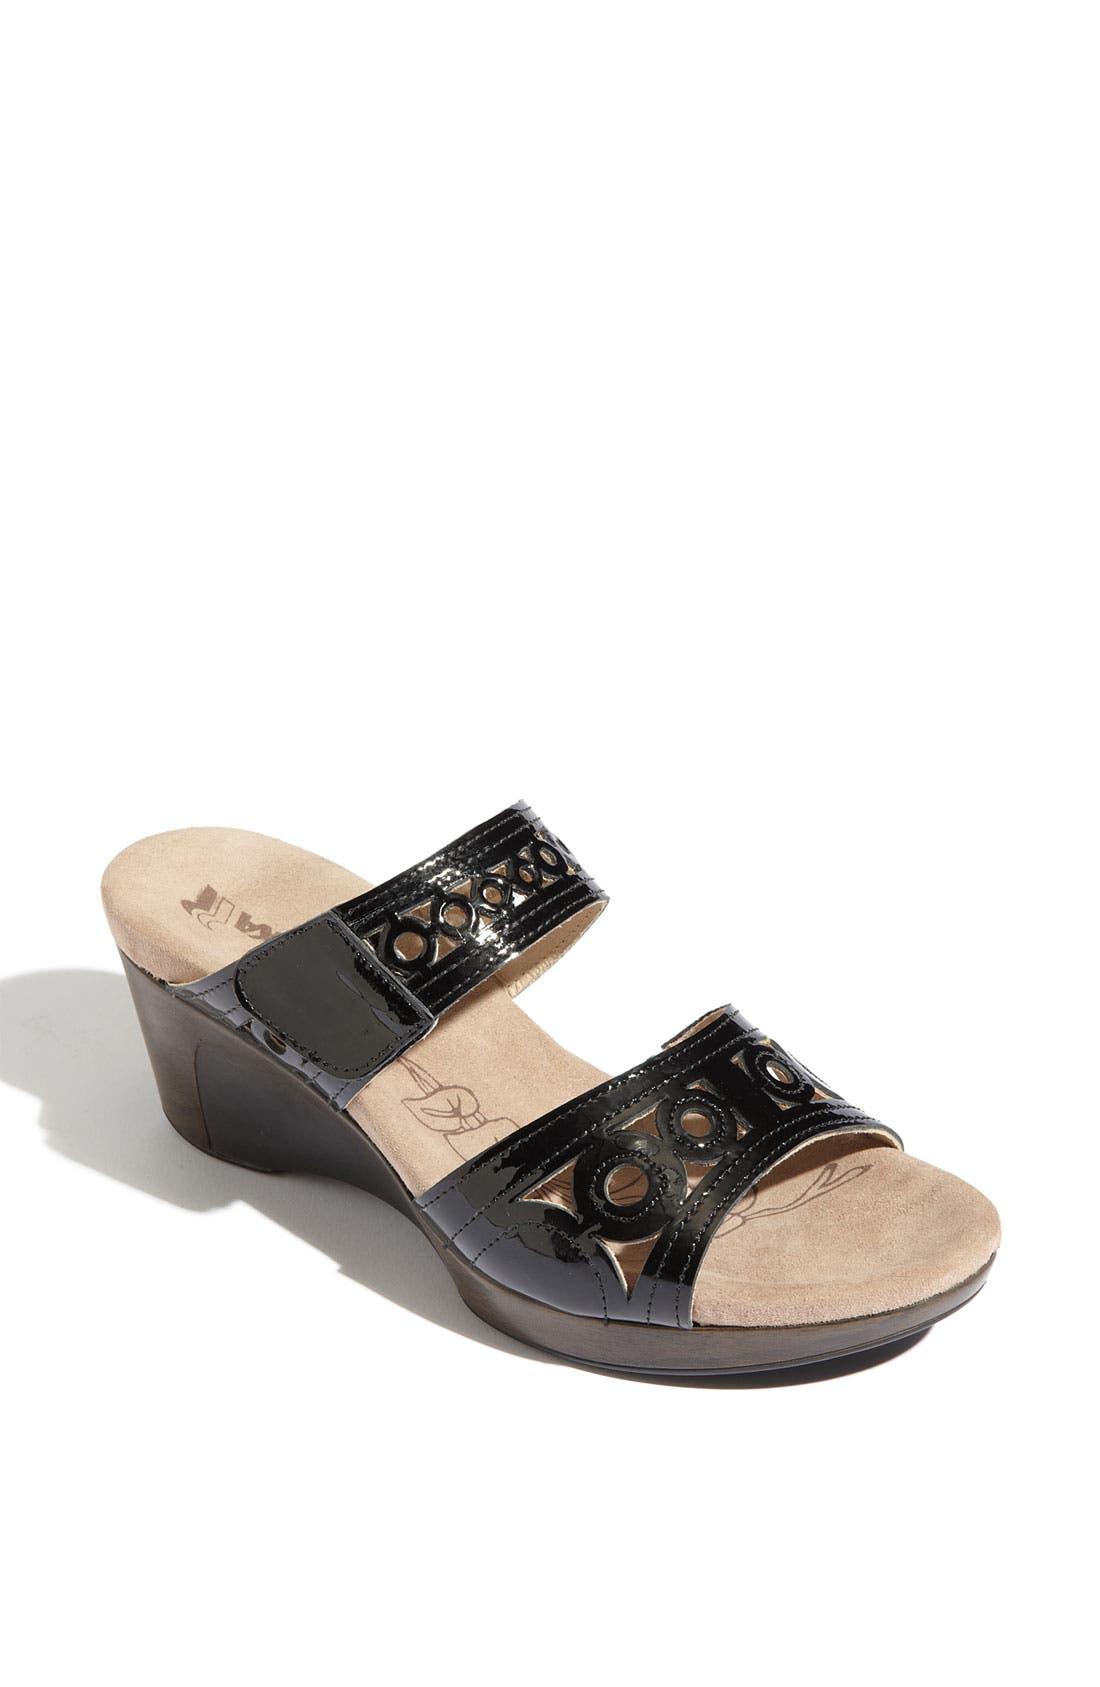 Main Image - Romika® 'Waikiki 16' Sandal